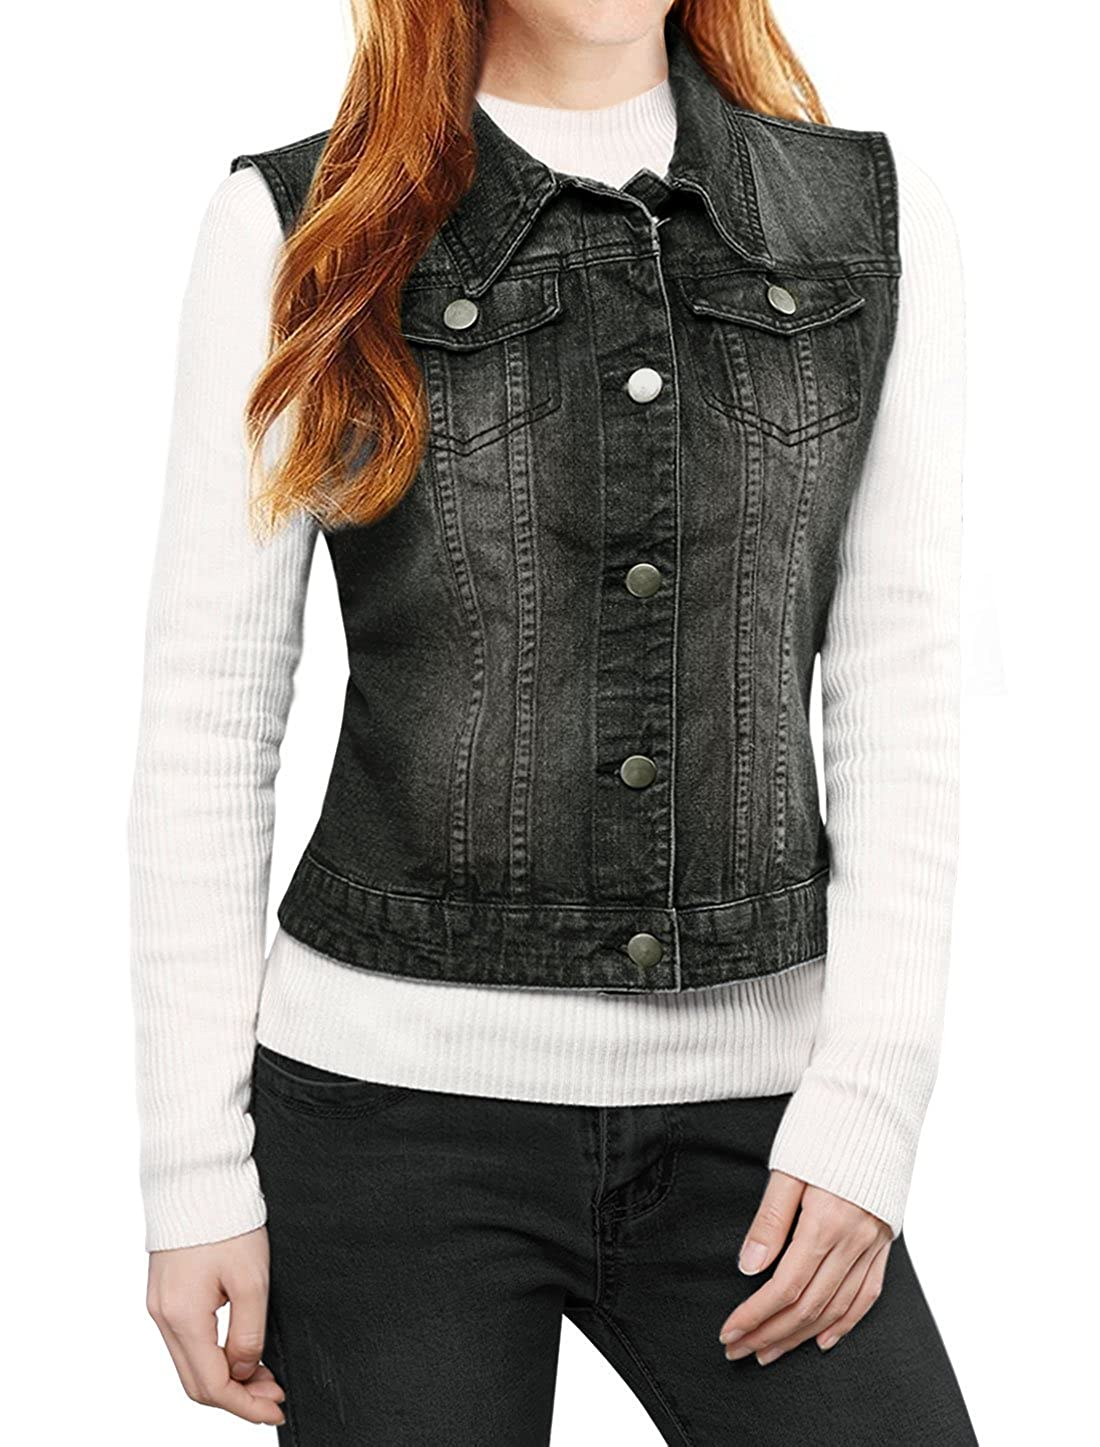 Allegra K Women's Buttoned Washed Denim Vest w Flap Pockets Black XL a16092300ux0405